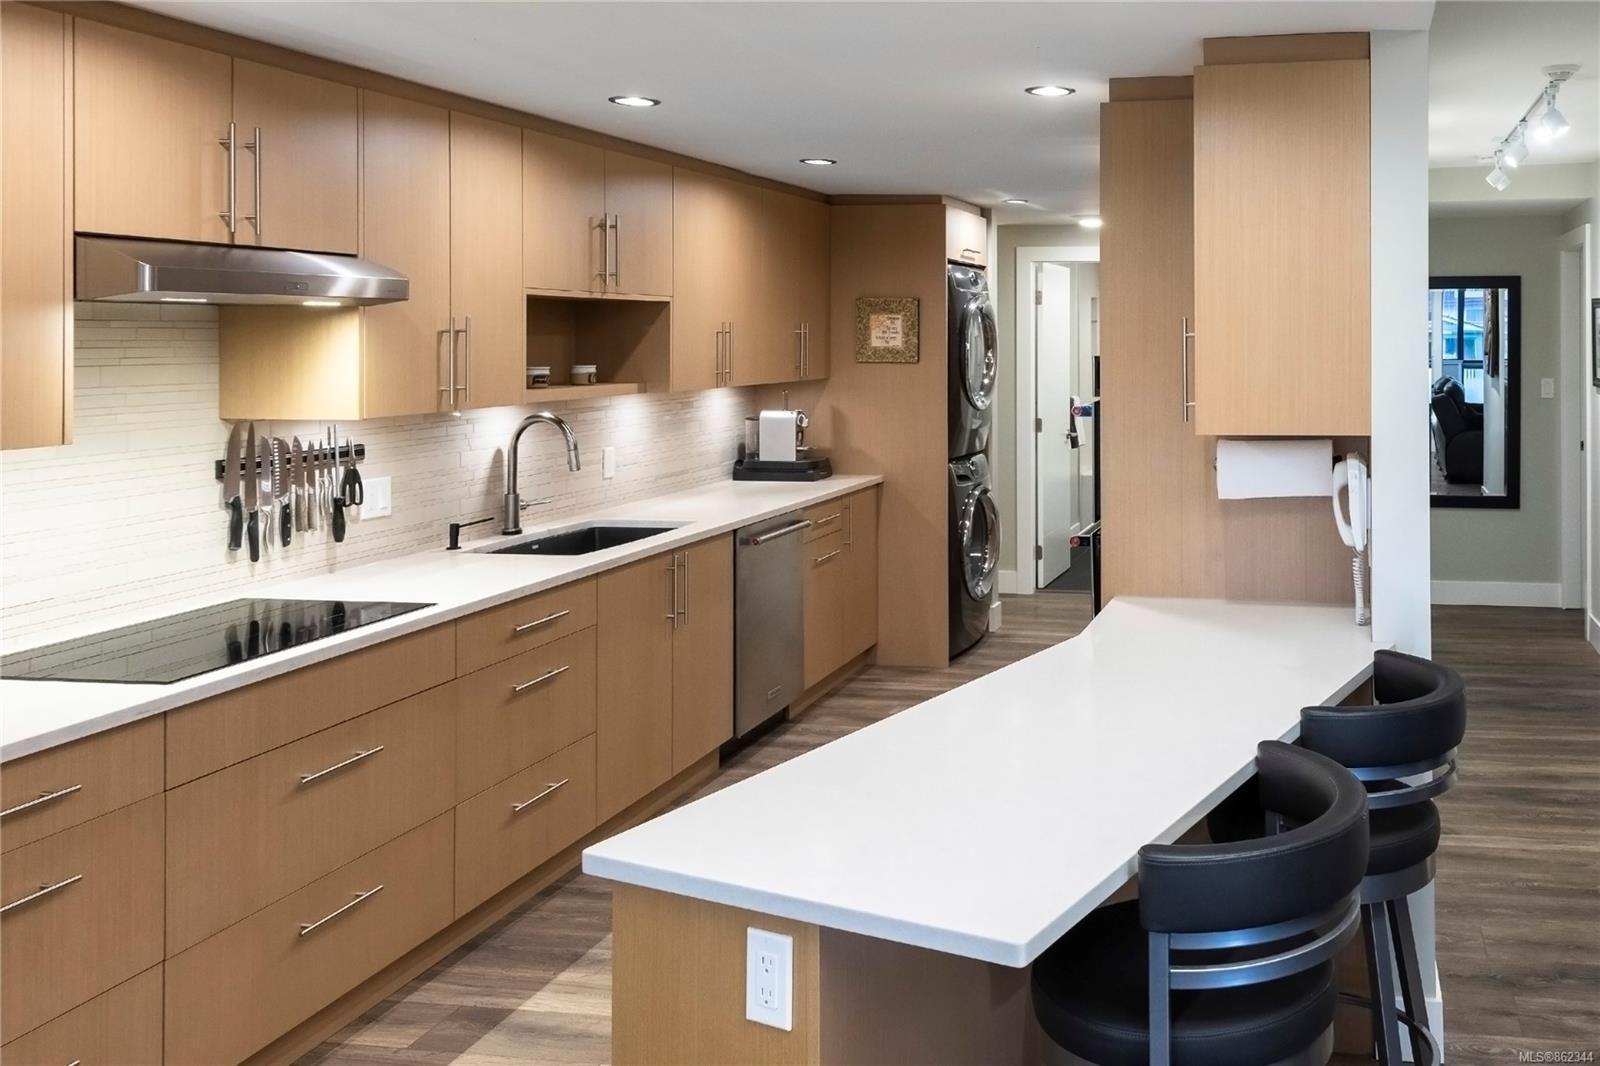 Main Photo: 505 420 Linden Ave in : Vi Fairfield West Condo for sale (Victoria)  : MLS®# 862344